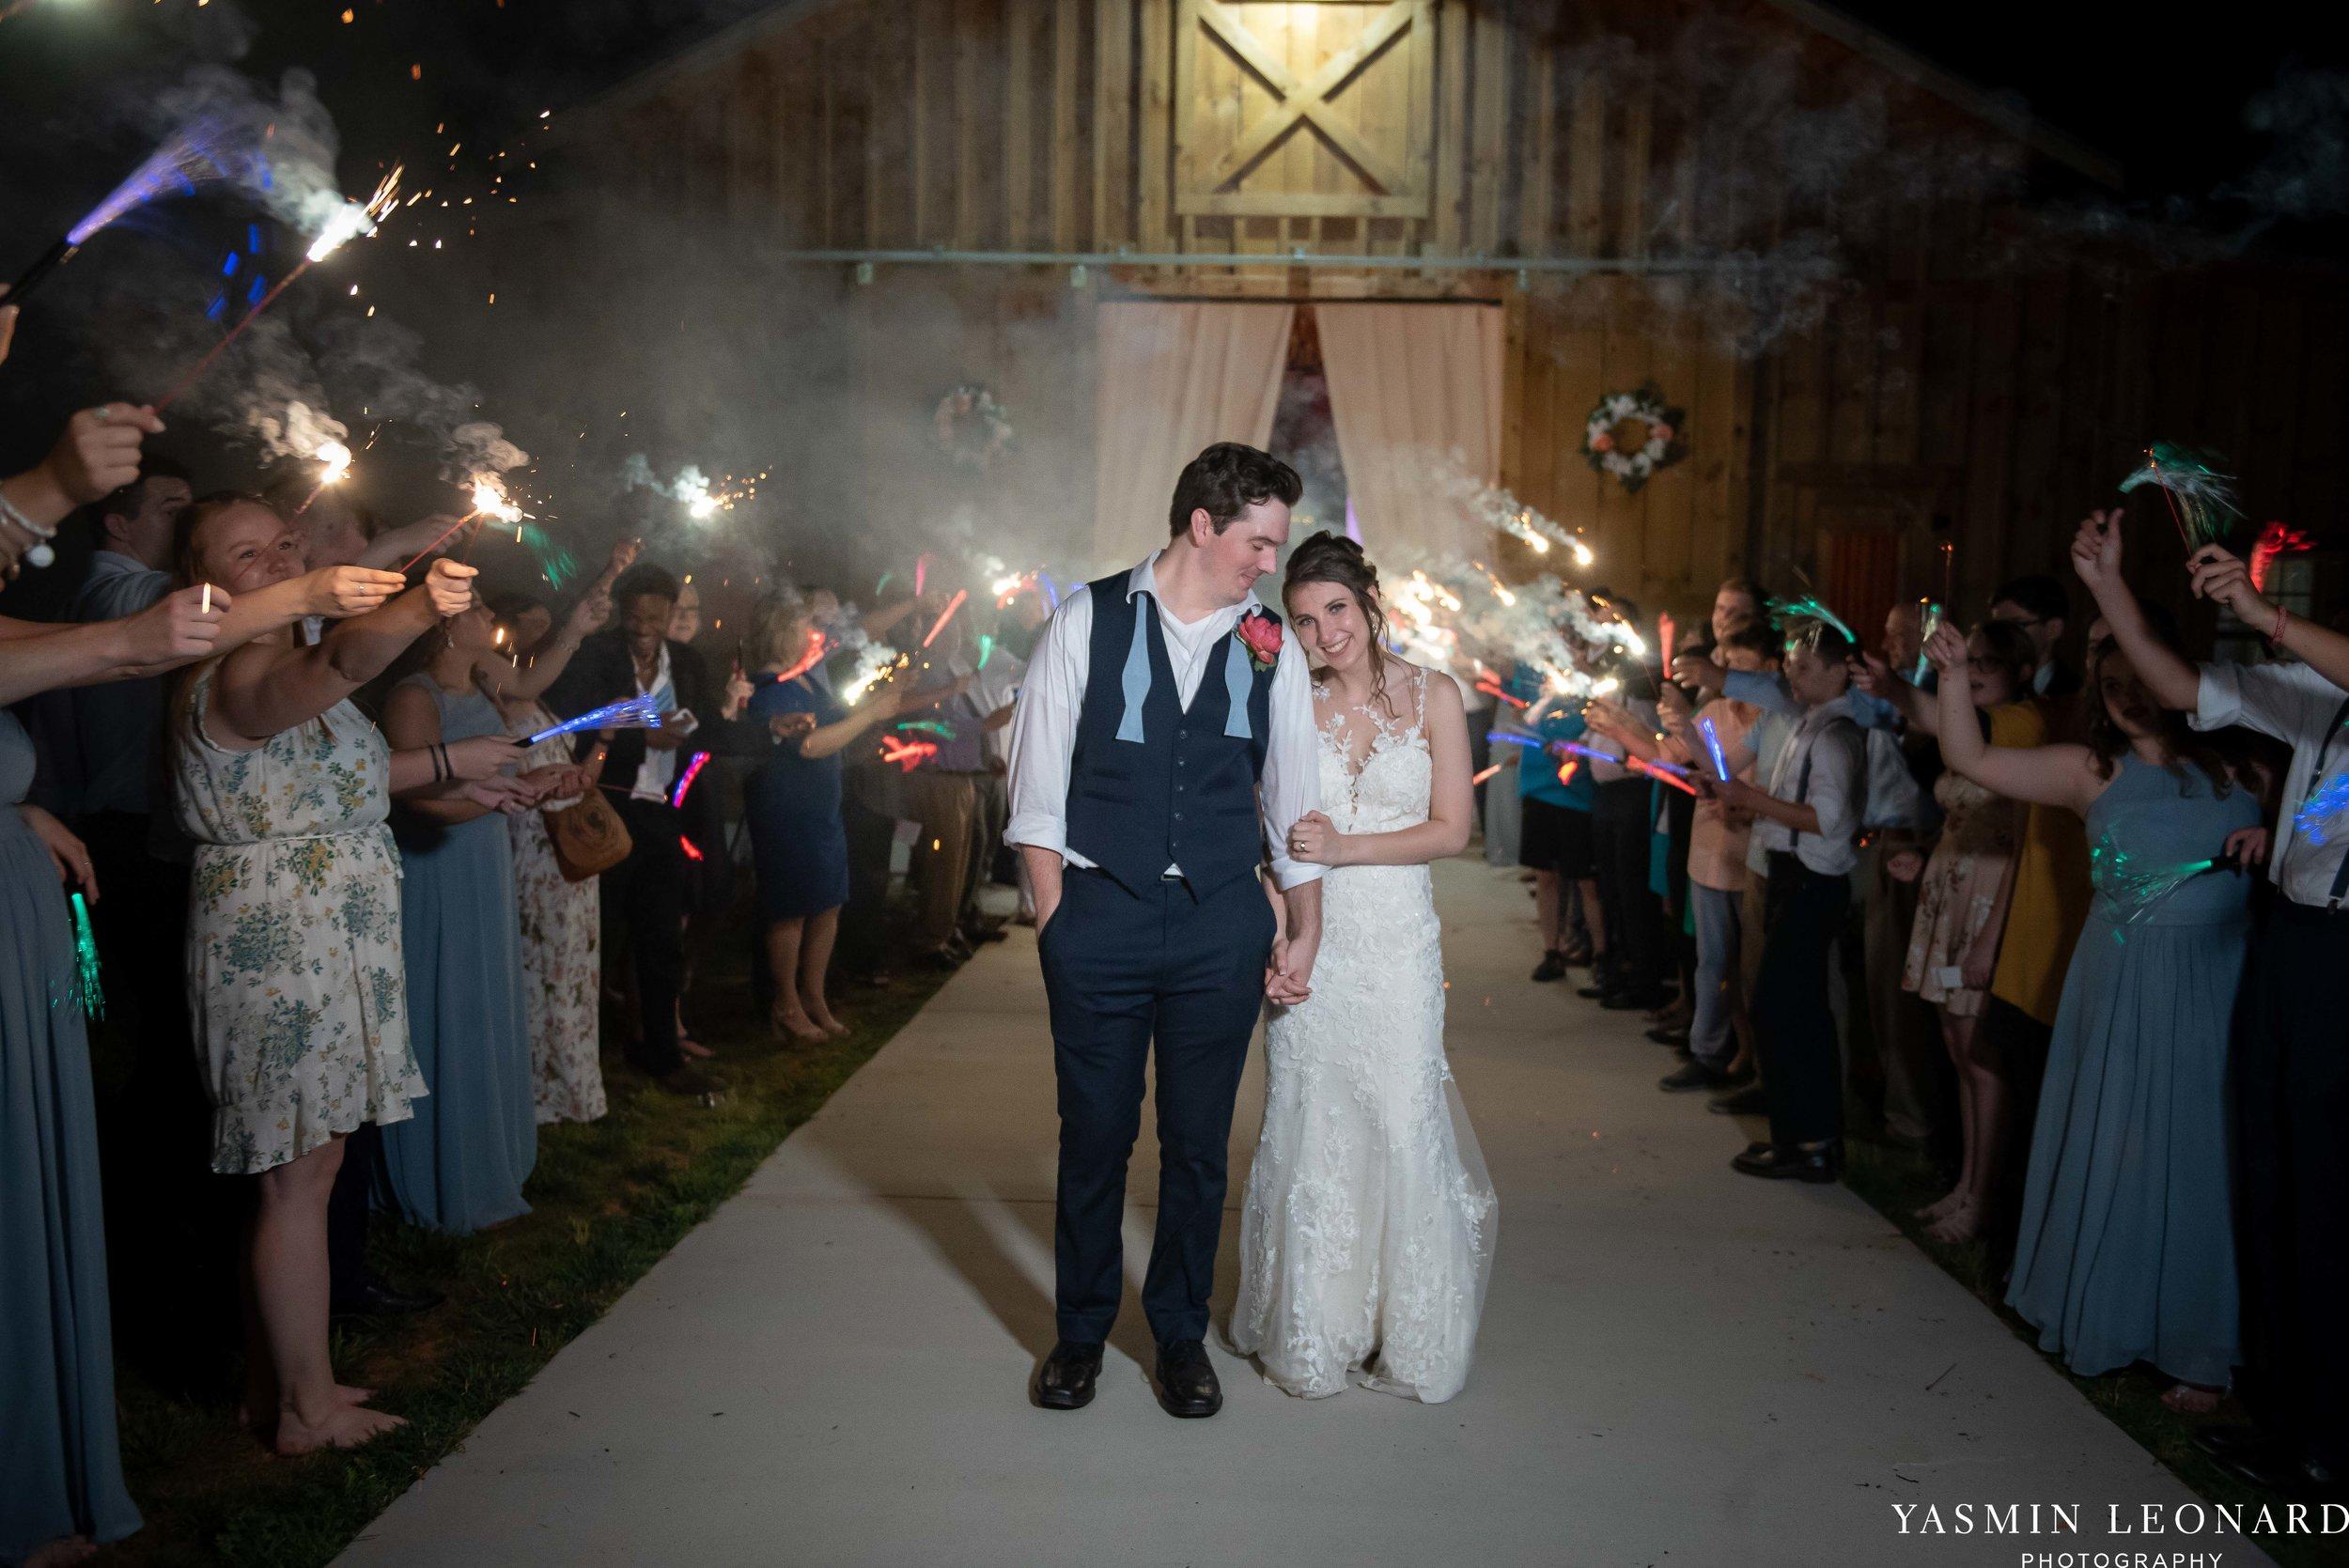 Old Homeplace Vineyard - NC Weddings - Outdoor Summer Weddings - Peony Boutique - Vineyard Wedding - NC Photographer - Yasmin Leonard Photography-82.jpg